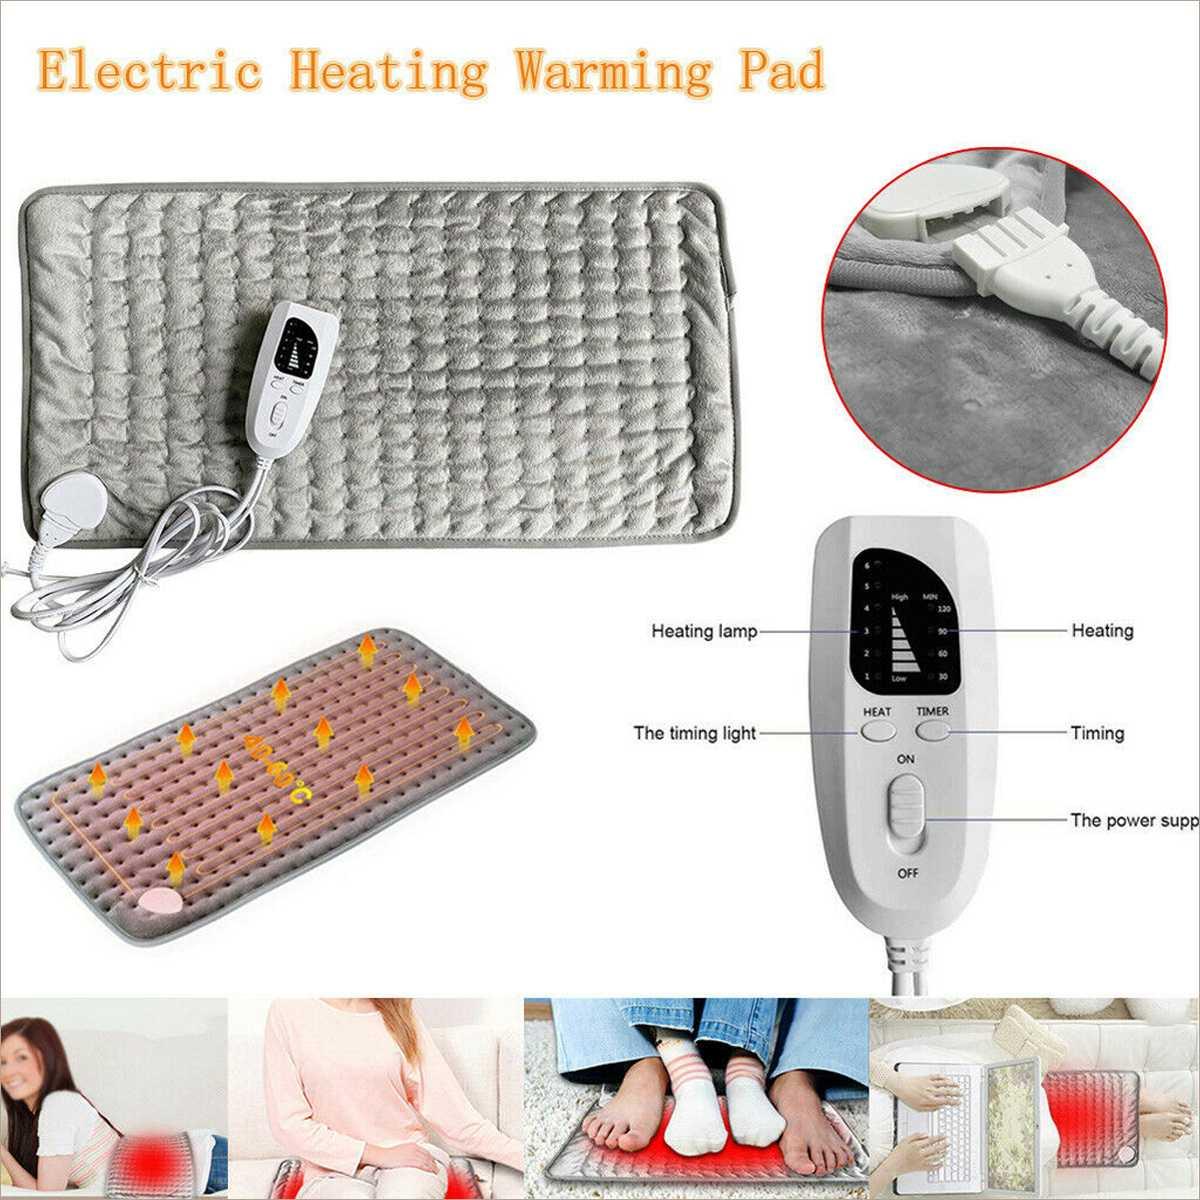 6 Level 120W Electric Heating Pad Timer For Shoulder Neck Back Spine Leg Pain Relief Winter Warmer 75x40cm 60x30cm EU/US/UK/AU enlarge